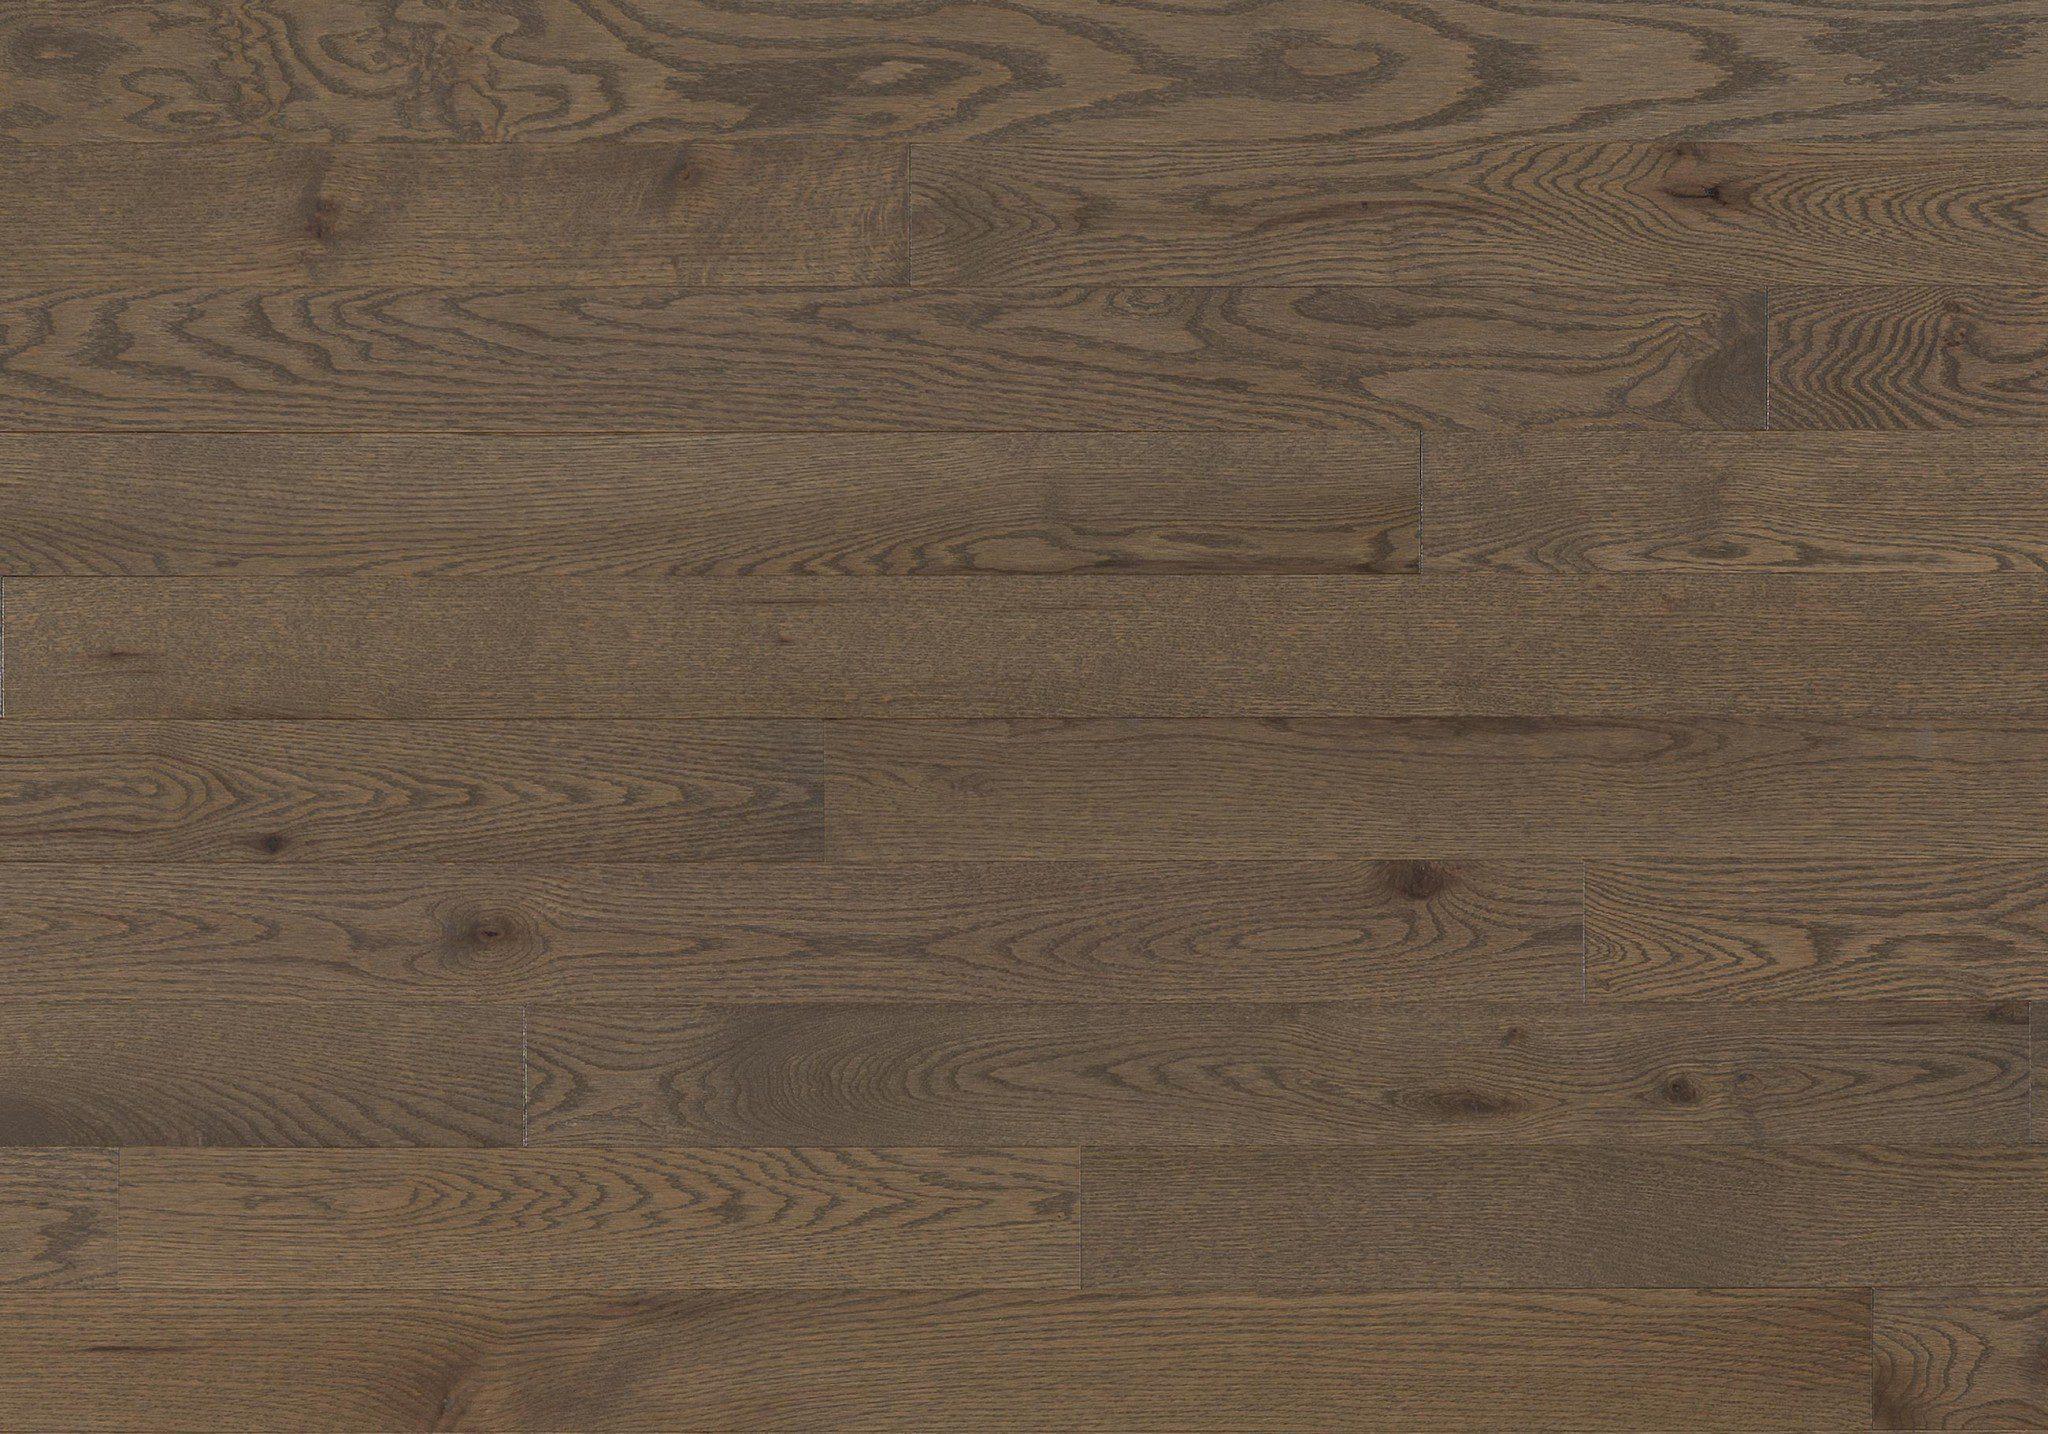 Red Oak Cape Cod Solid Width: 3 1/4